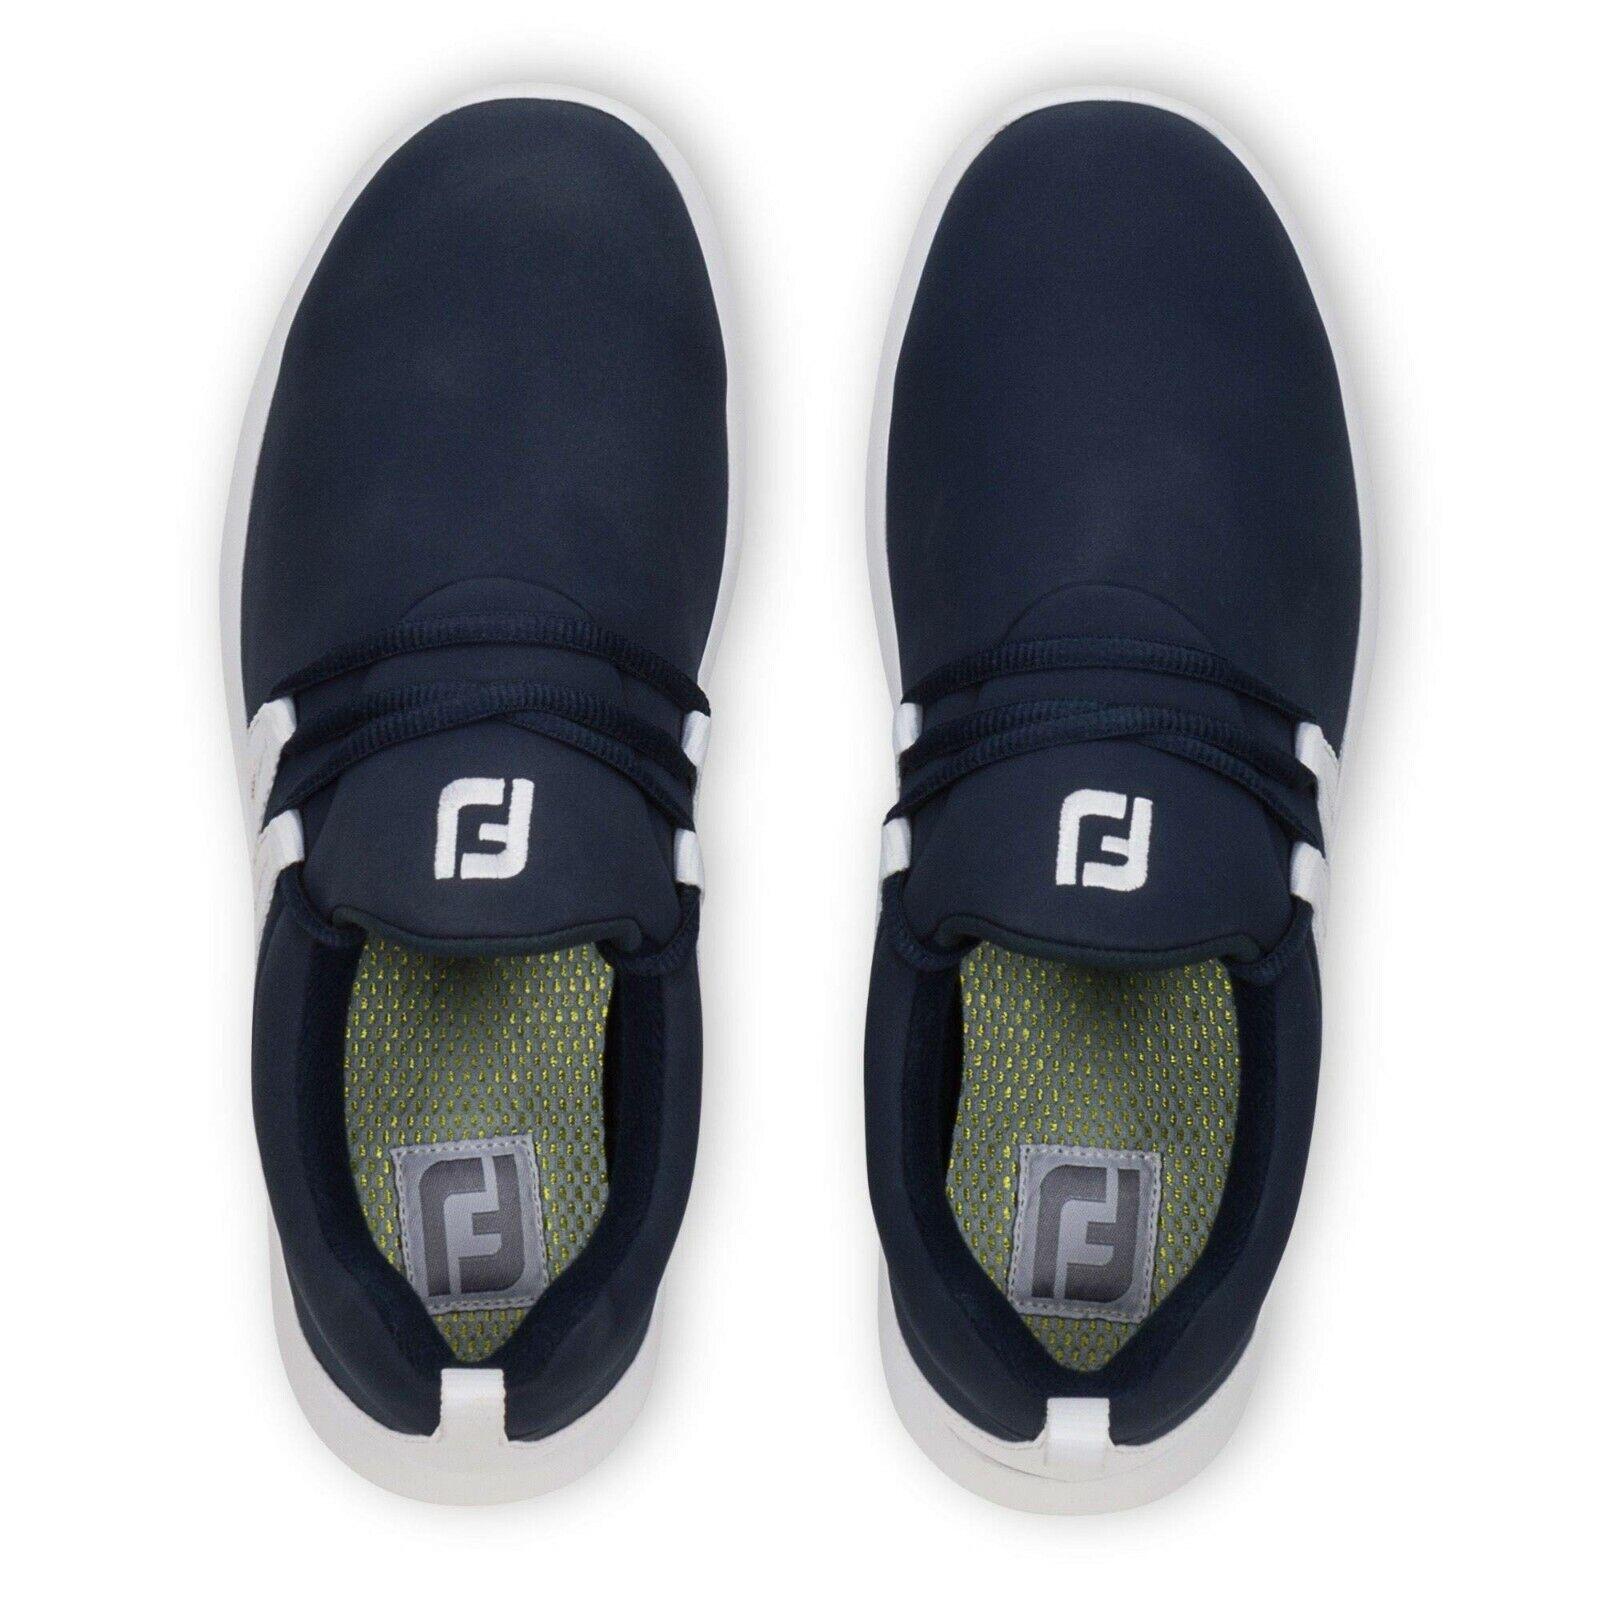 Brand New FootJoy Women's Fj Leisure Slip-on Golf Shoes - Choose Size 2